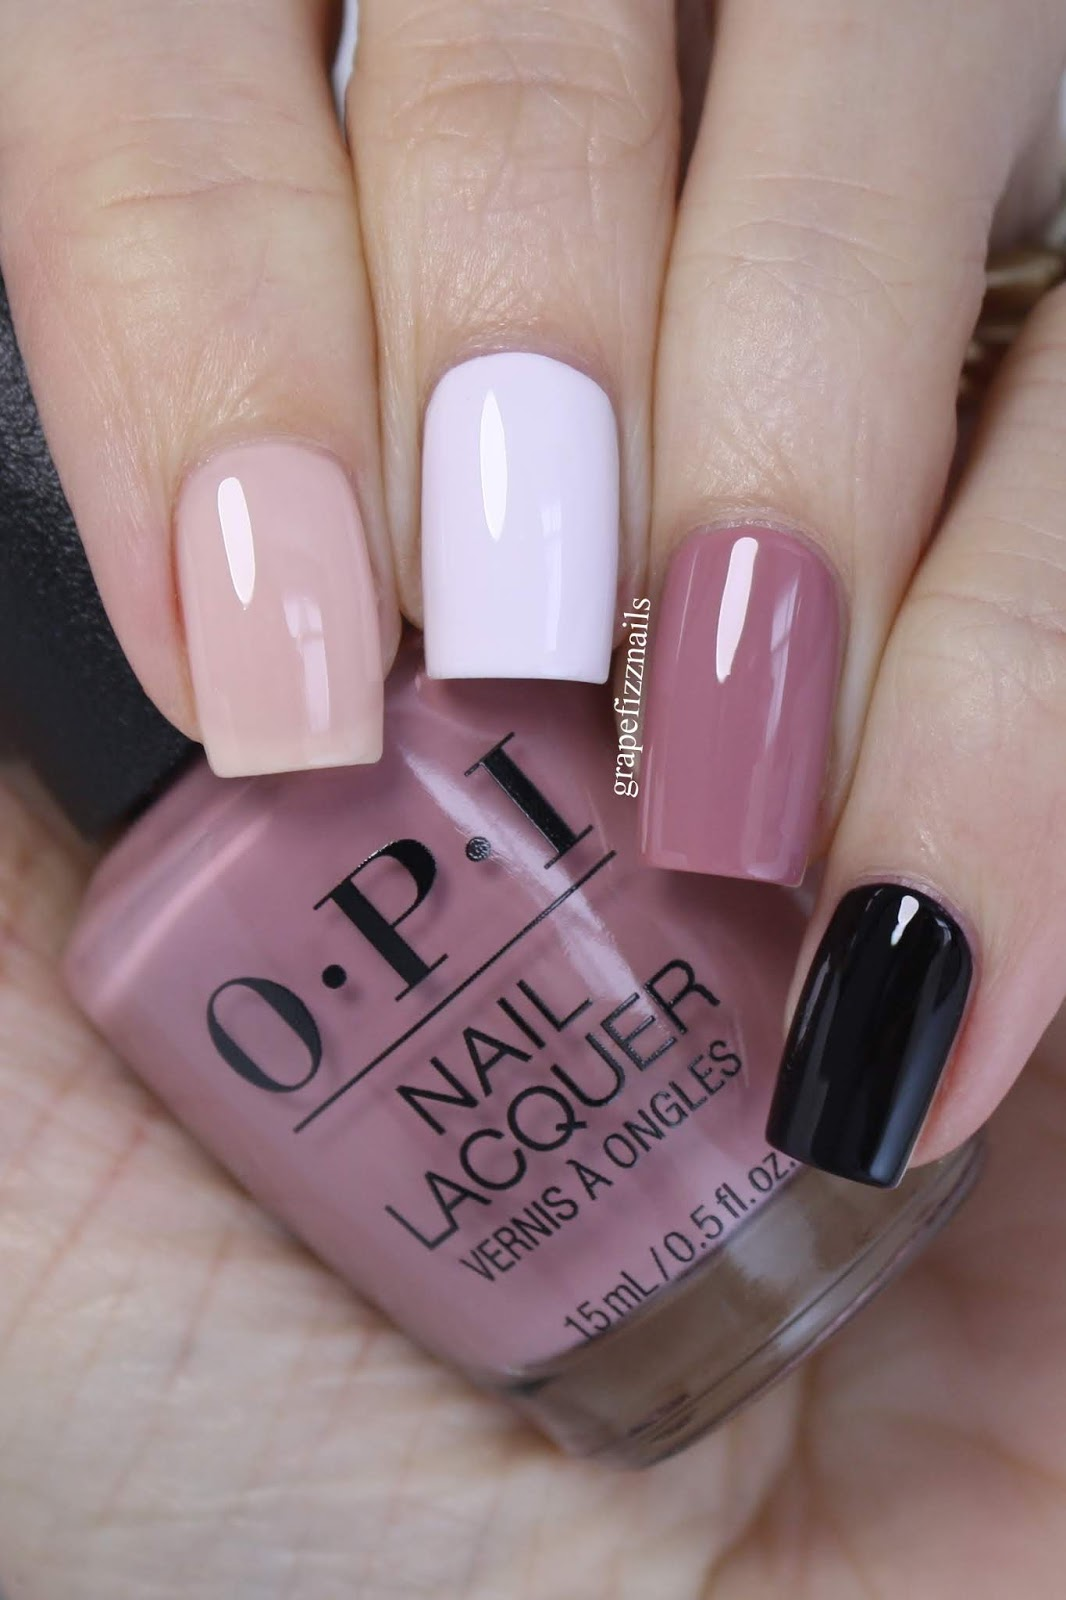 Grape Fizz Nails: New OPI DS Tourmaline   Nail polish